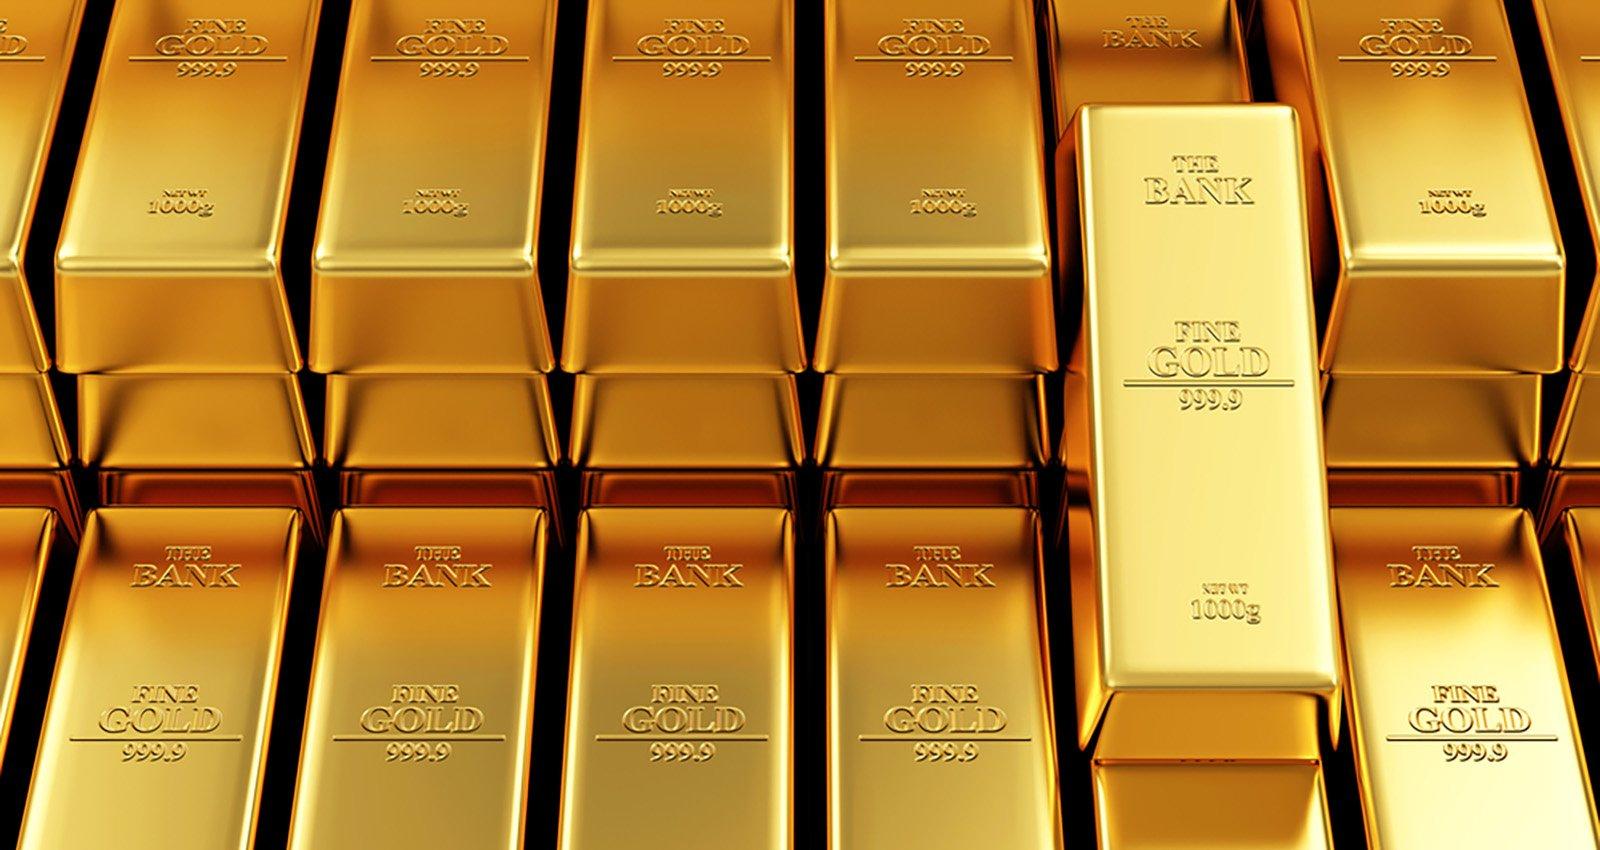 Deutsche kaufen Rekordmengen an Gold